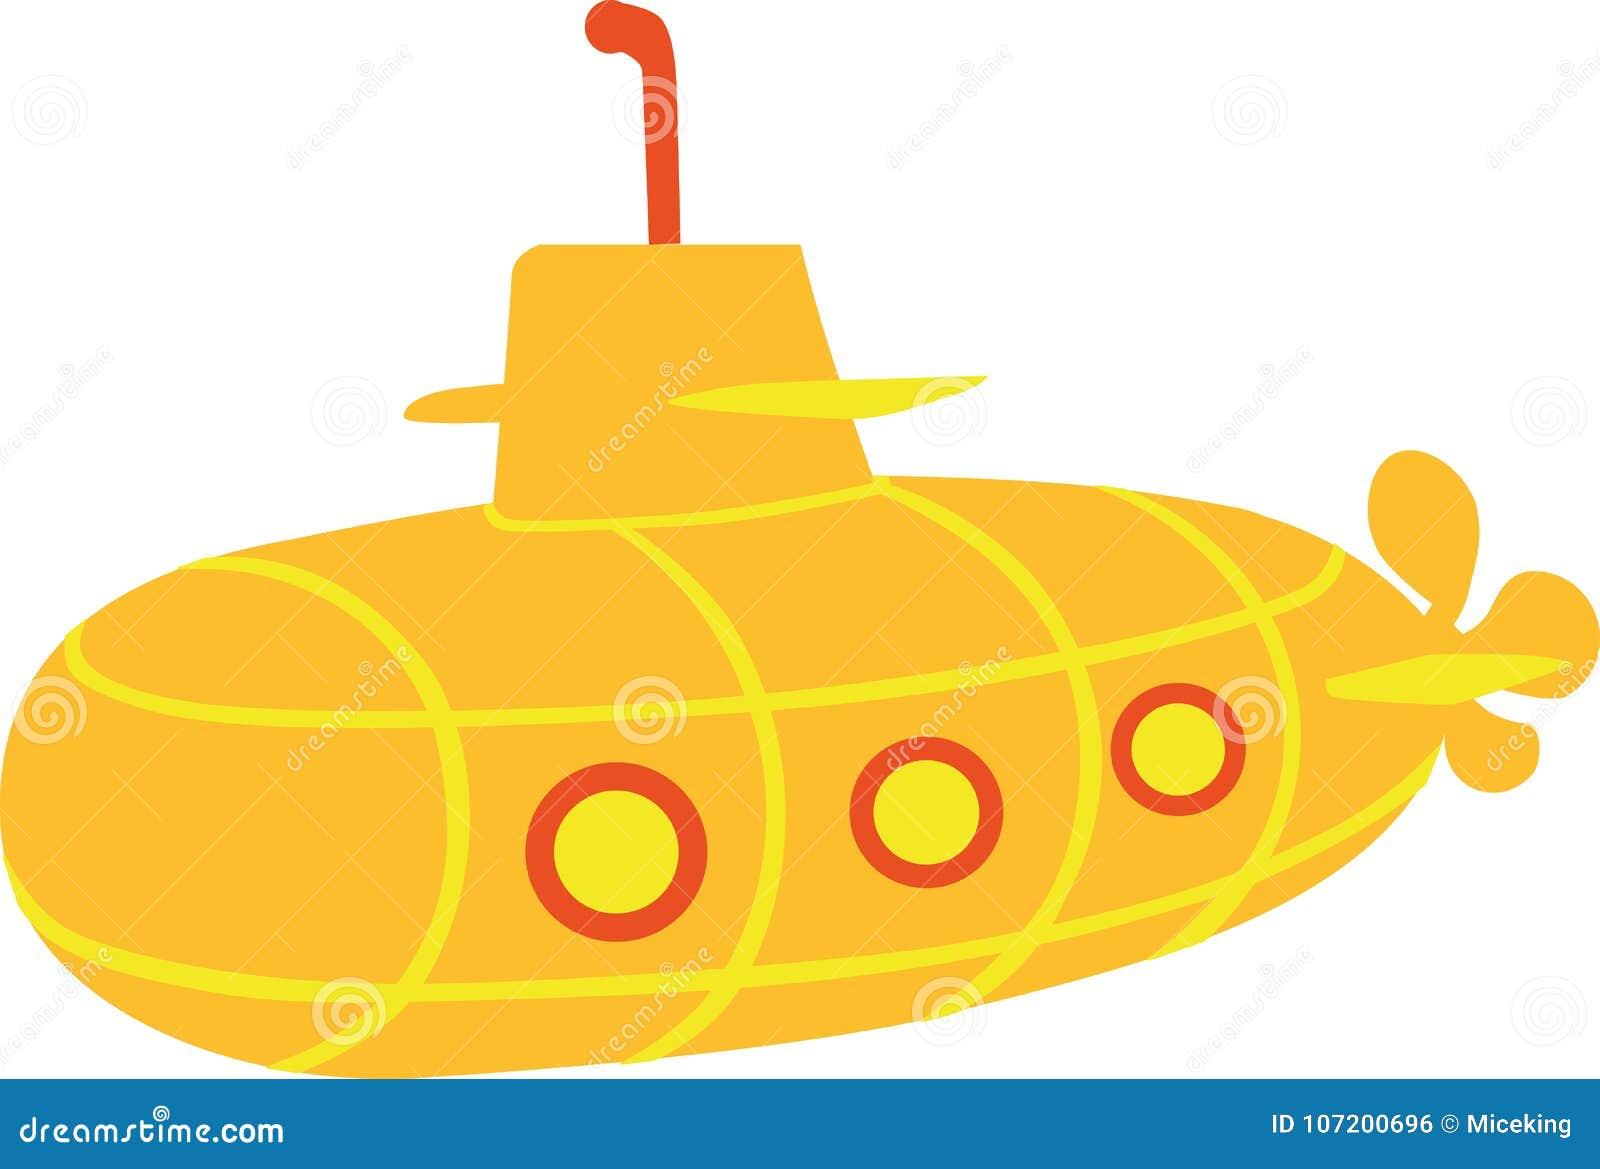 Yellow Submarine Stock Illustrations – 618 Yellow ...